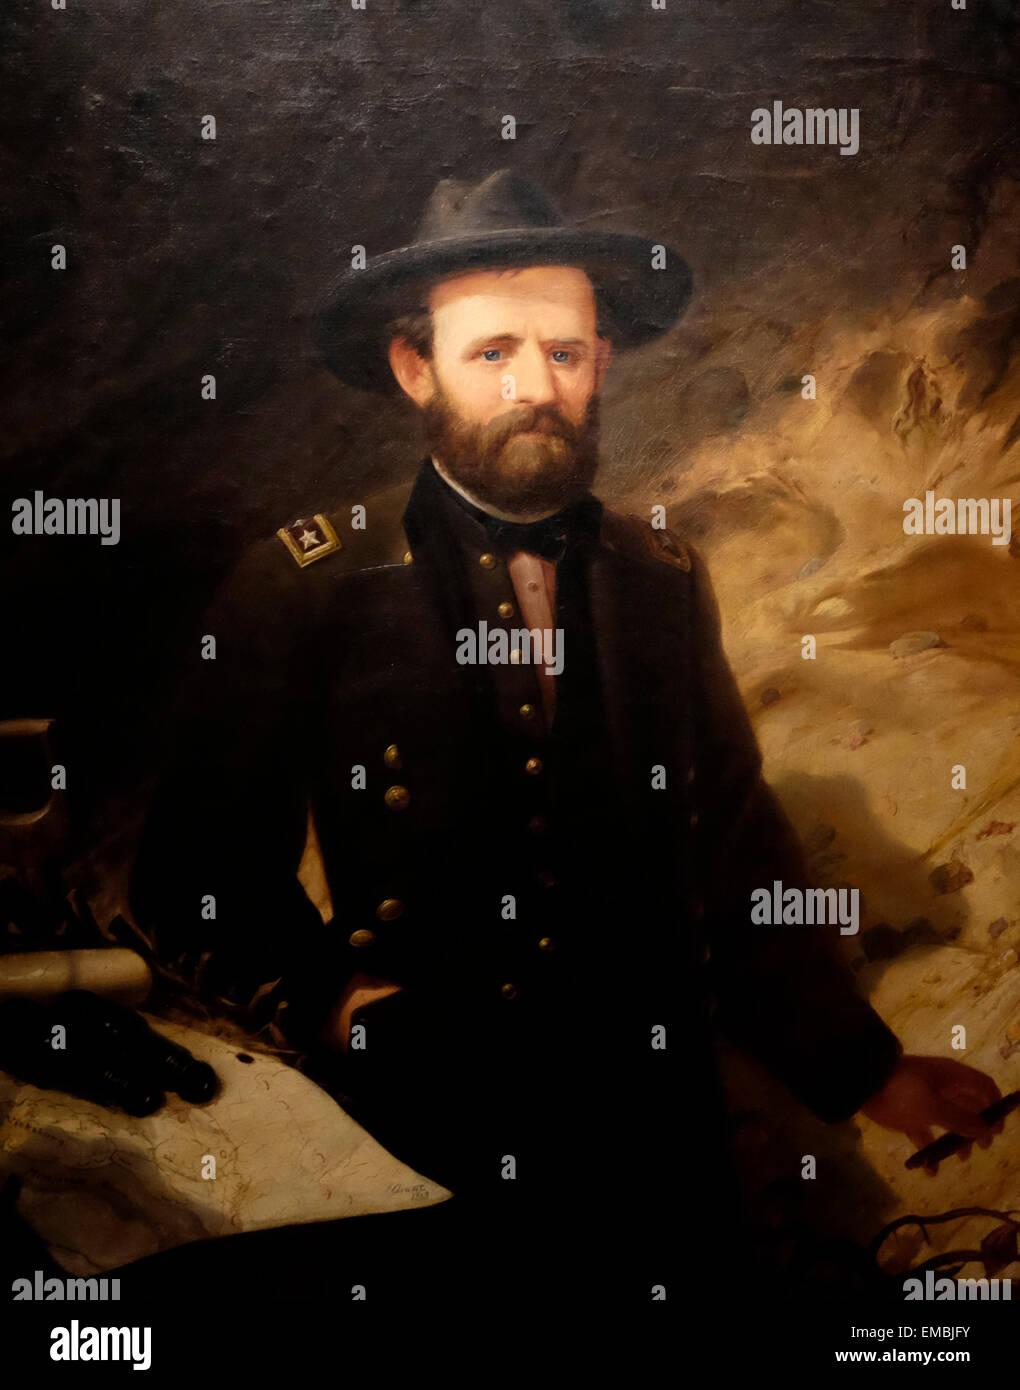 Portrait of General Ulysses S Grant - 1865 - Ole Peter Hansen Balling - Stock Image